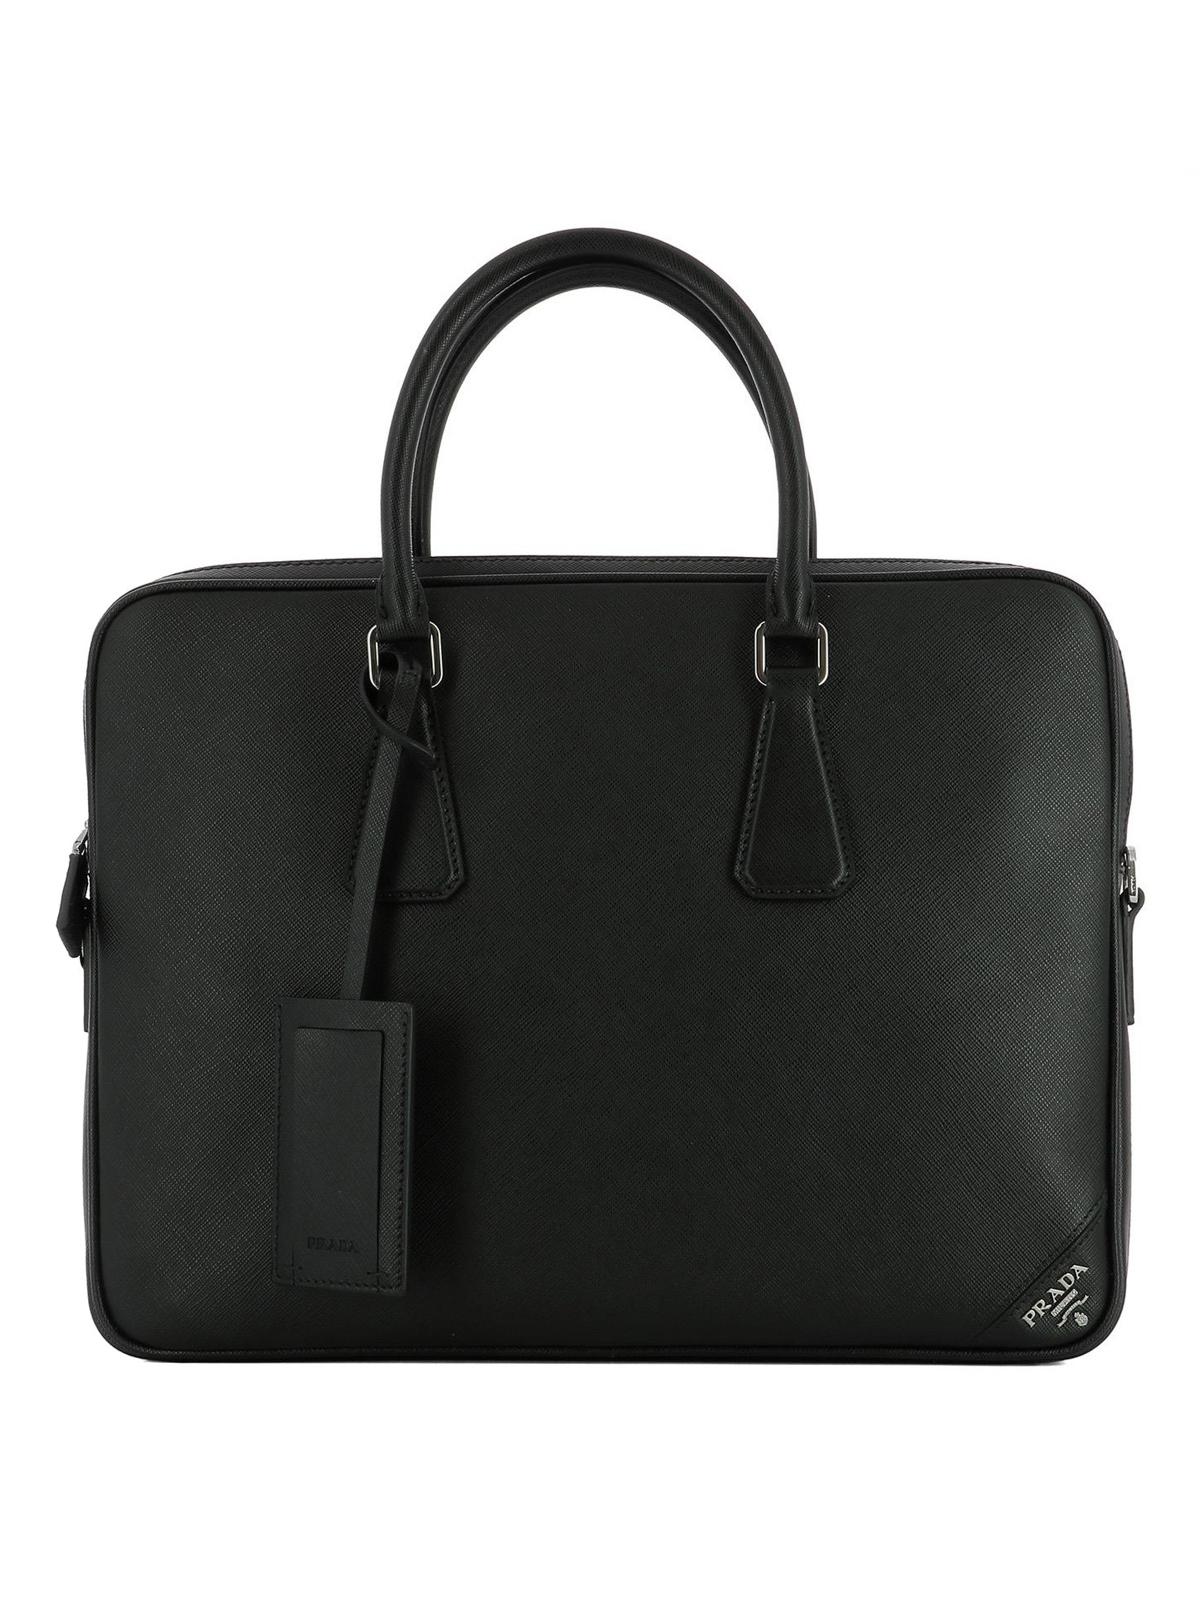 7d4385398892 PRADA  laptop bags   briefcases - Saffiano leather classic briefcase